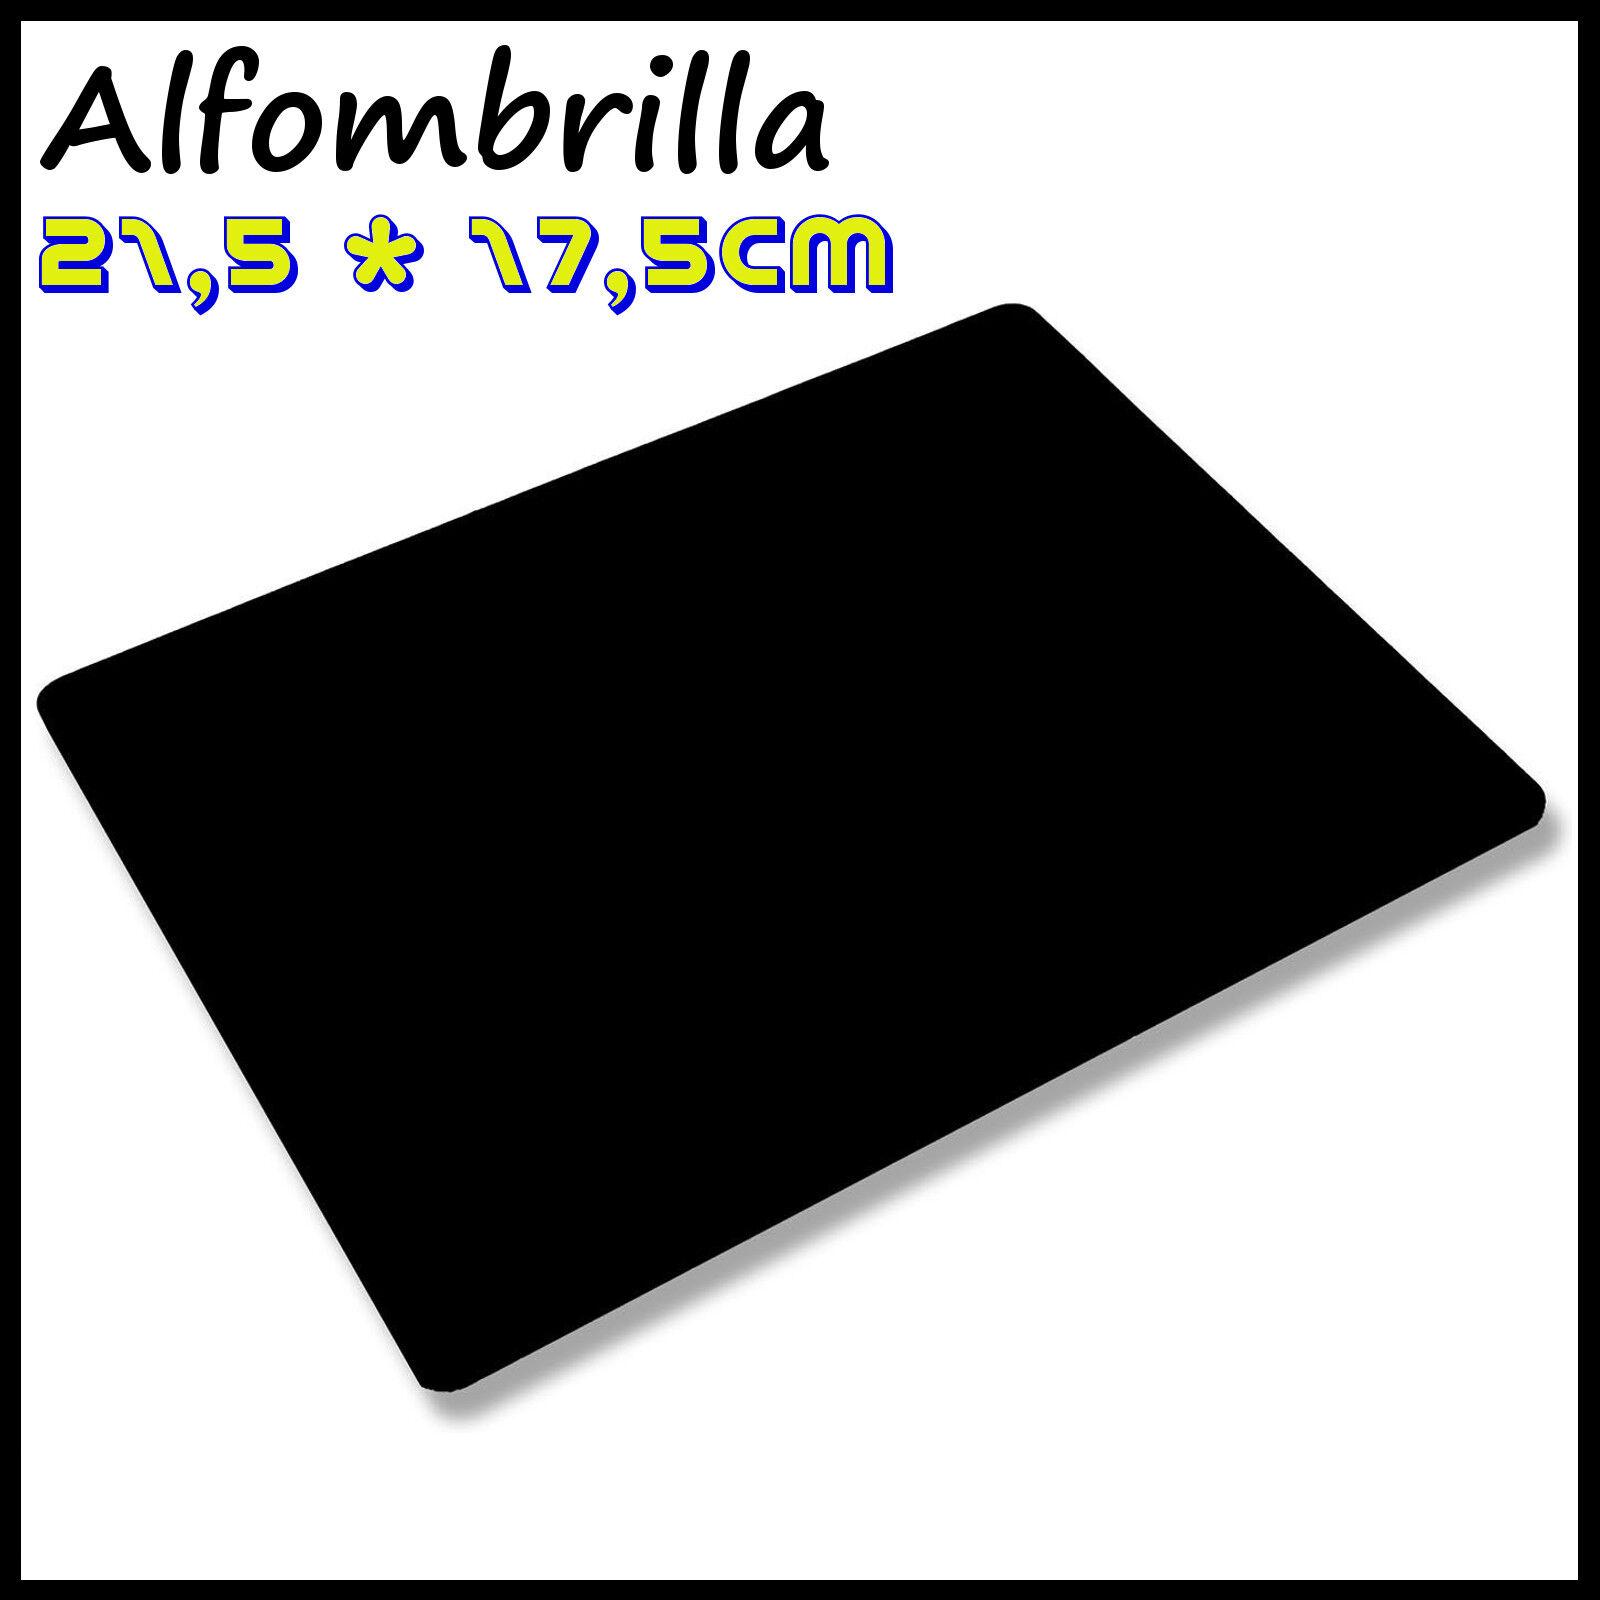 Alfombrilla De Raton Para Mouse Antibacteriana 21,5x17cm Negra - 1,61 €